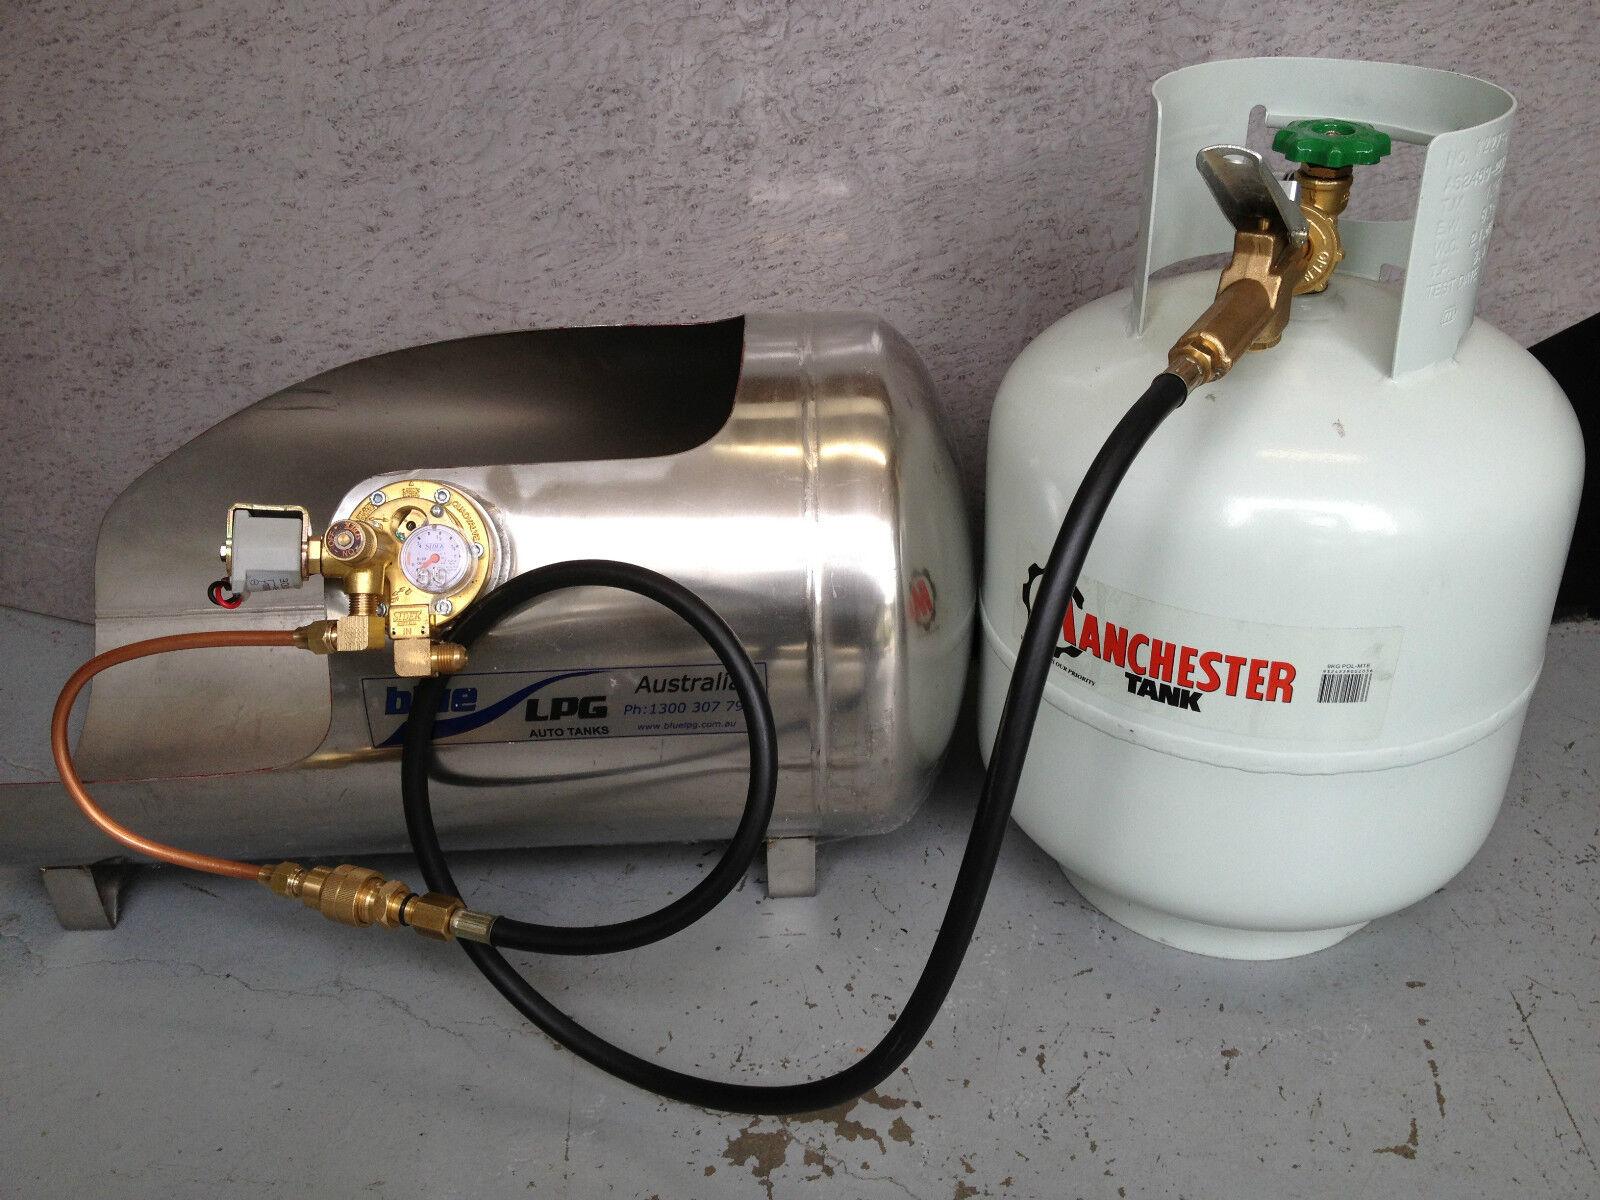 LPG Filler Gun /& Hose  with Automotive LPG Tank Decanting Fitting